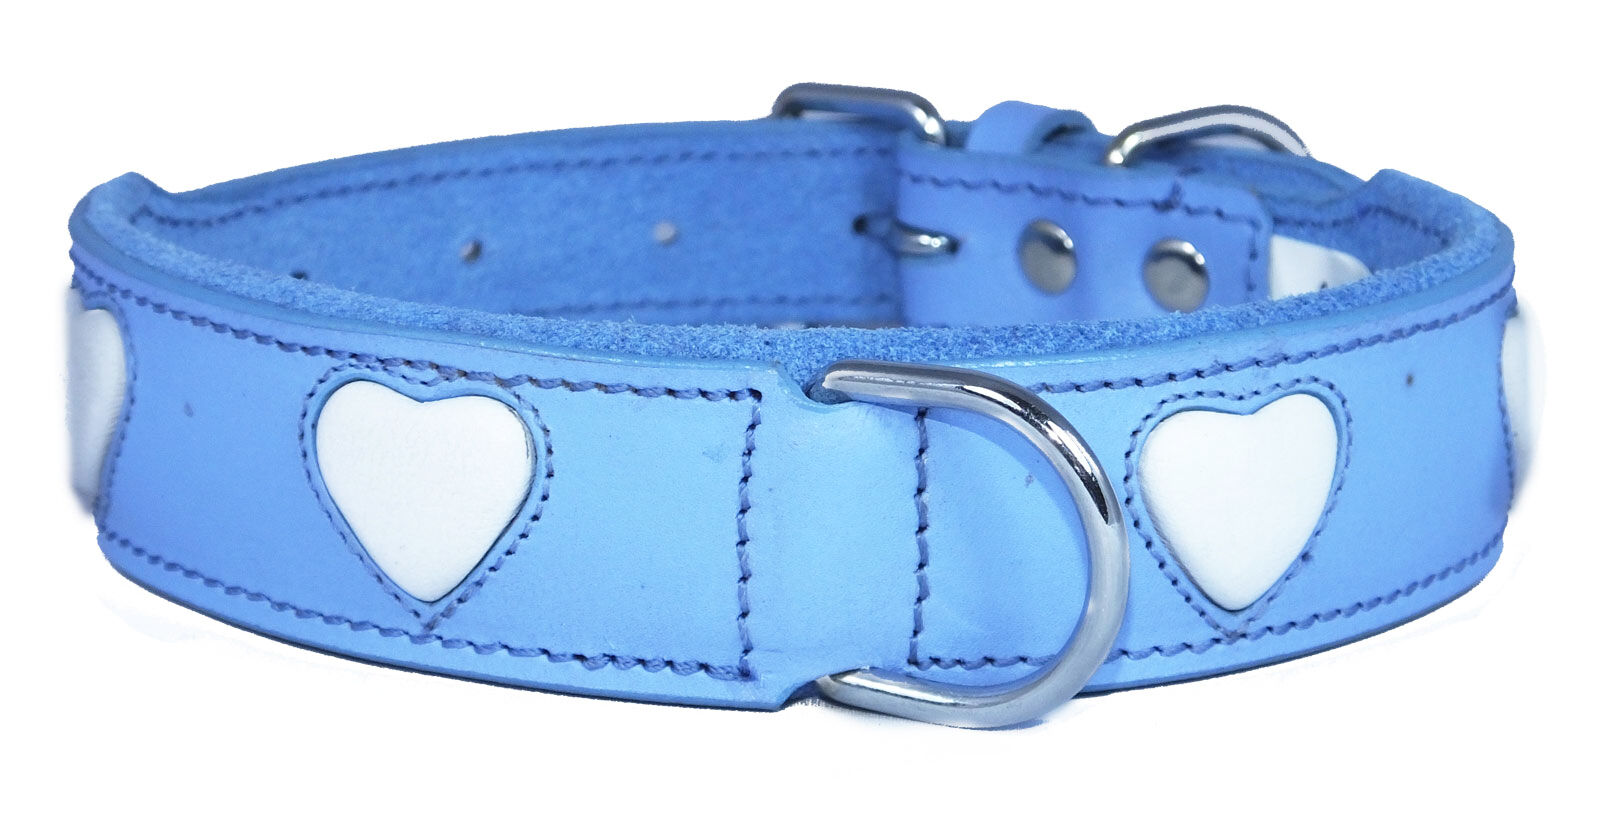 bluee Leather Dog Collar White Heart Staffy Staffordshire Bull Terrier Collar